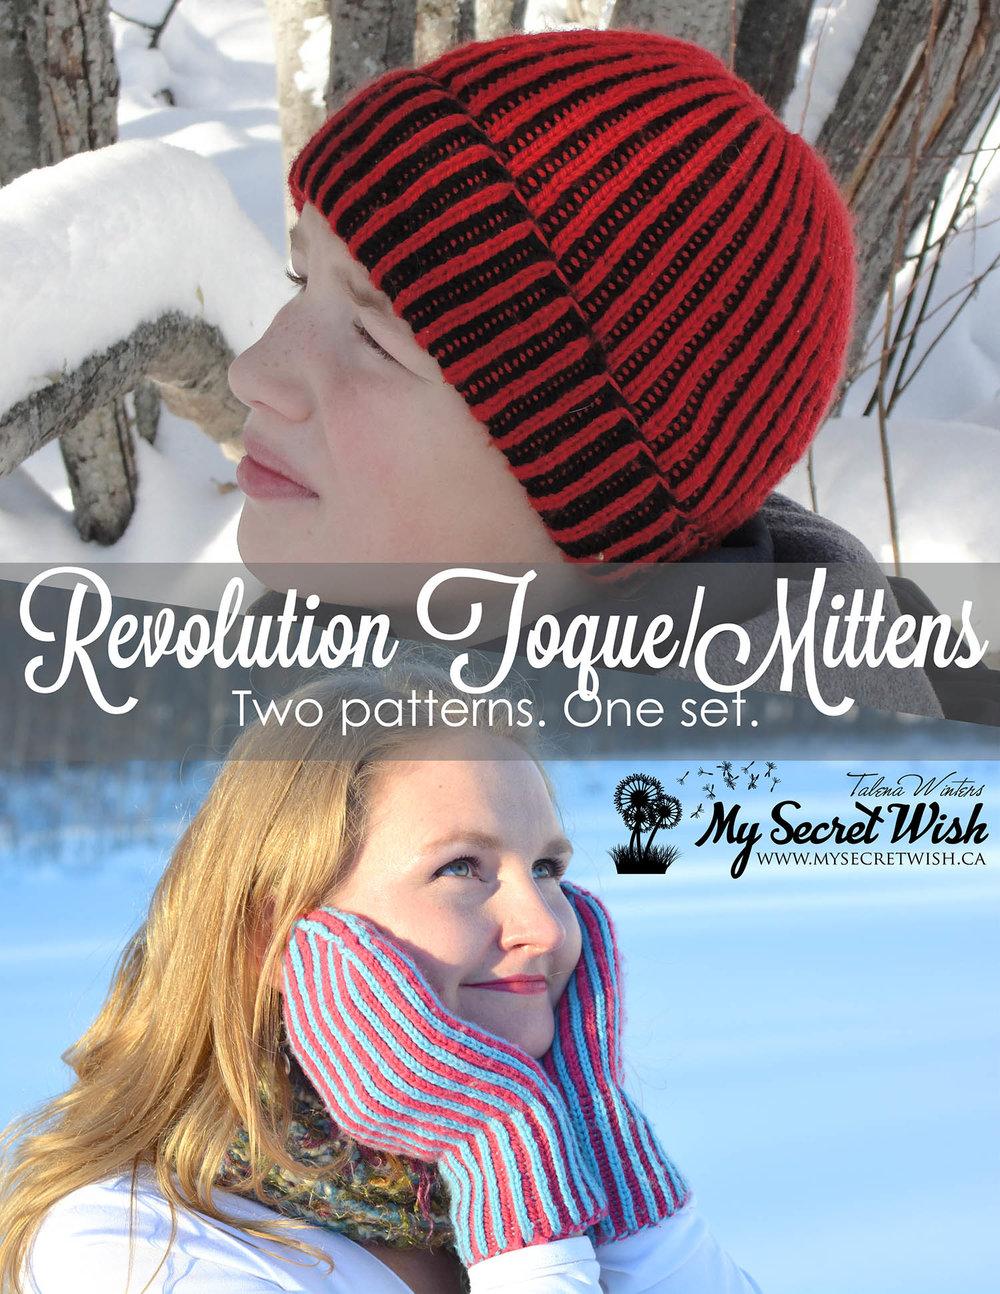 Revolution Toque and Mittens set - brioche knit pattern for beginners b023b8ea7ec